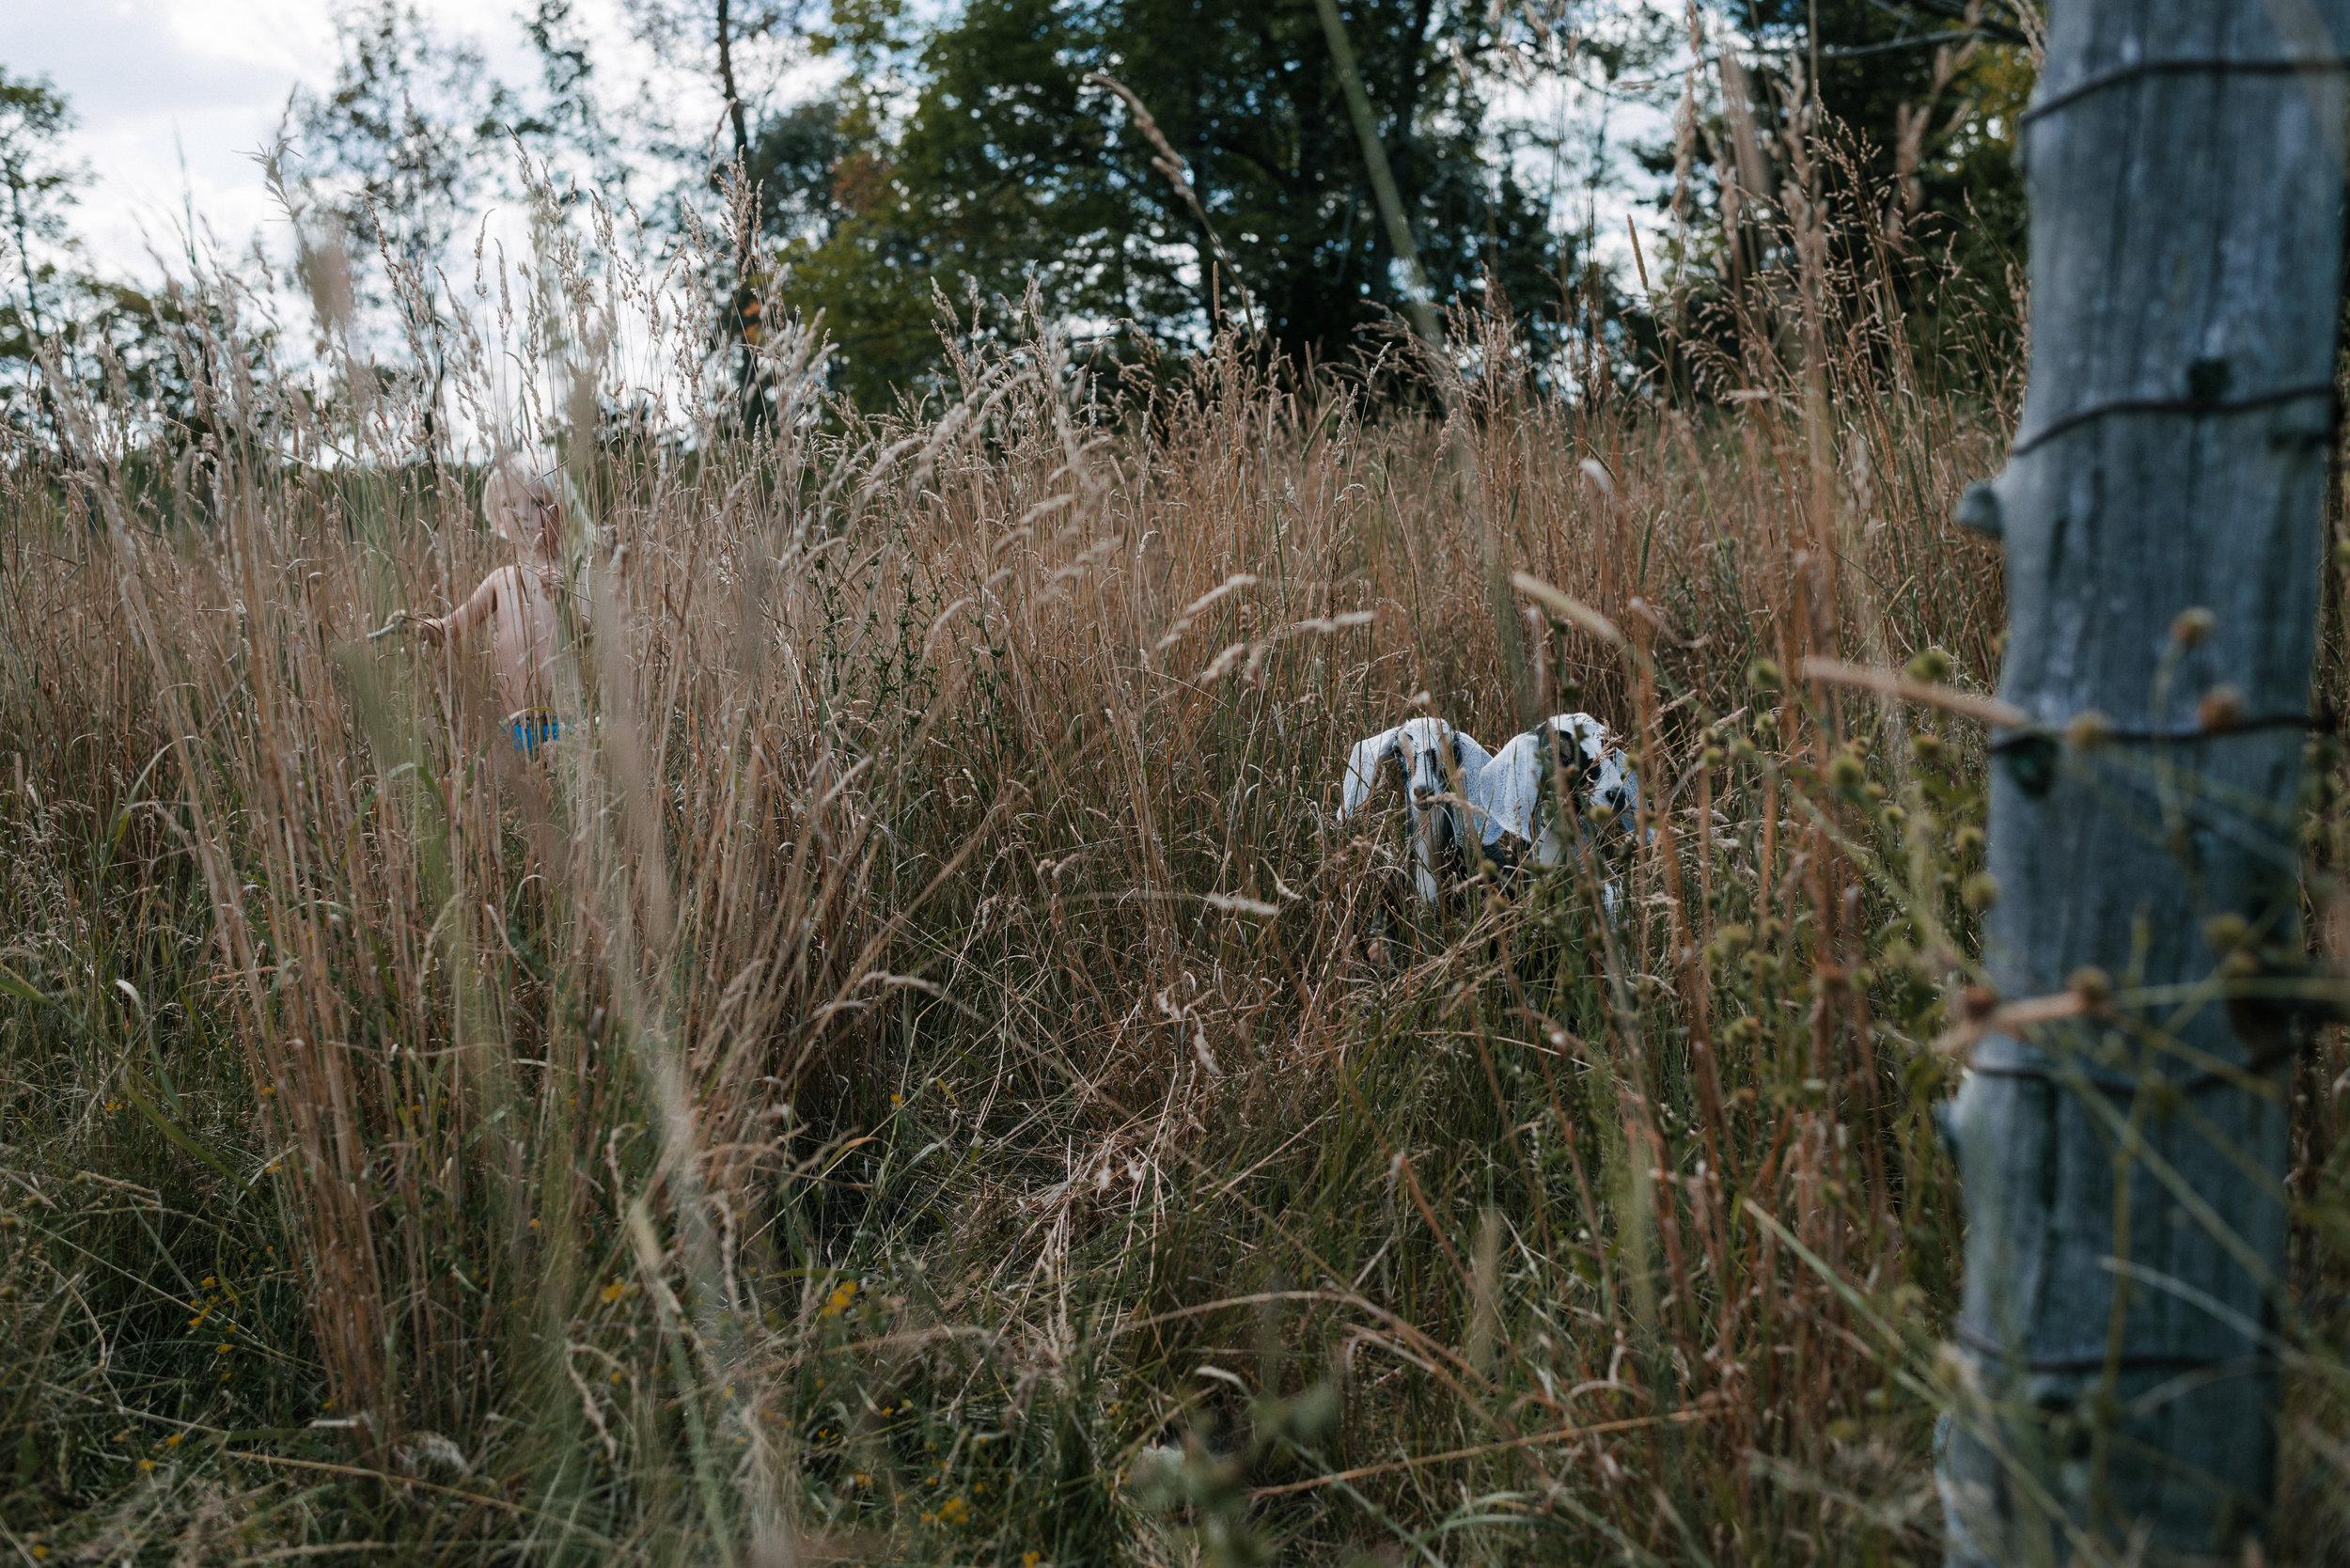 family documentary photography in kingston by viara mileva-153316vm.jpg